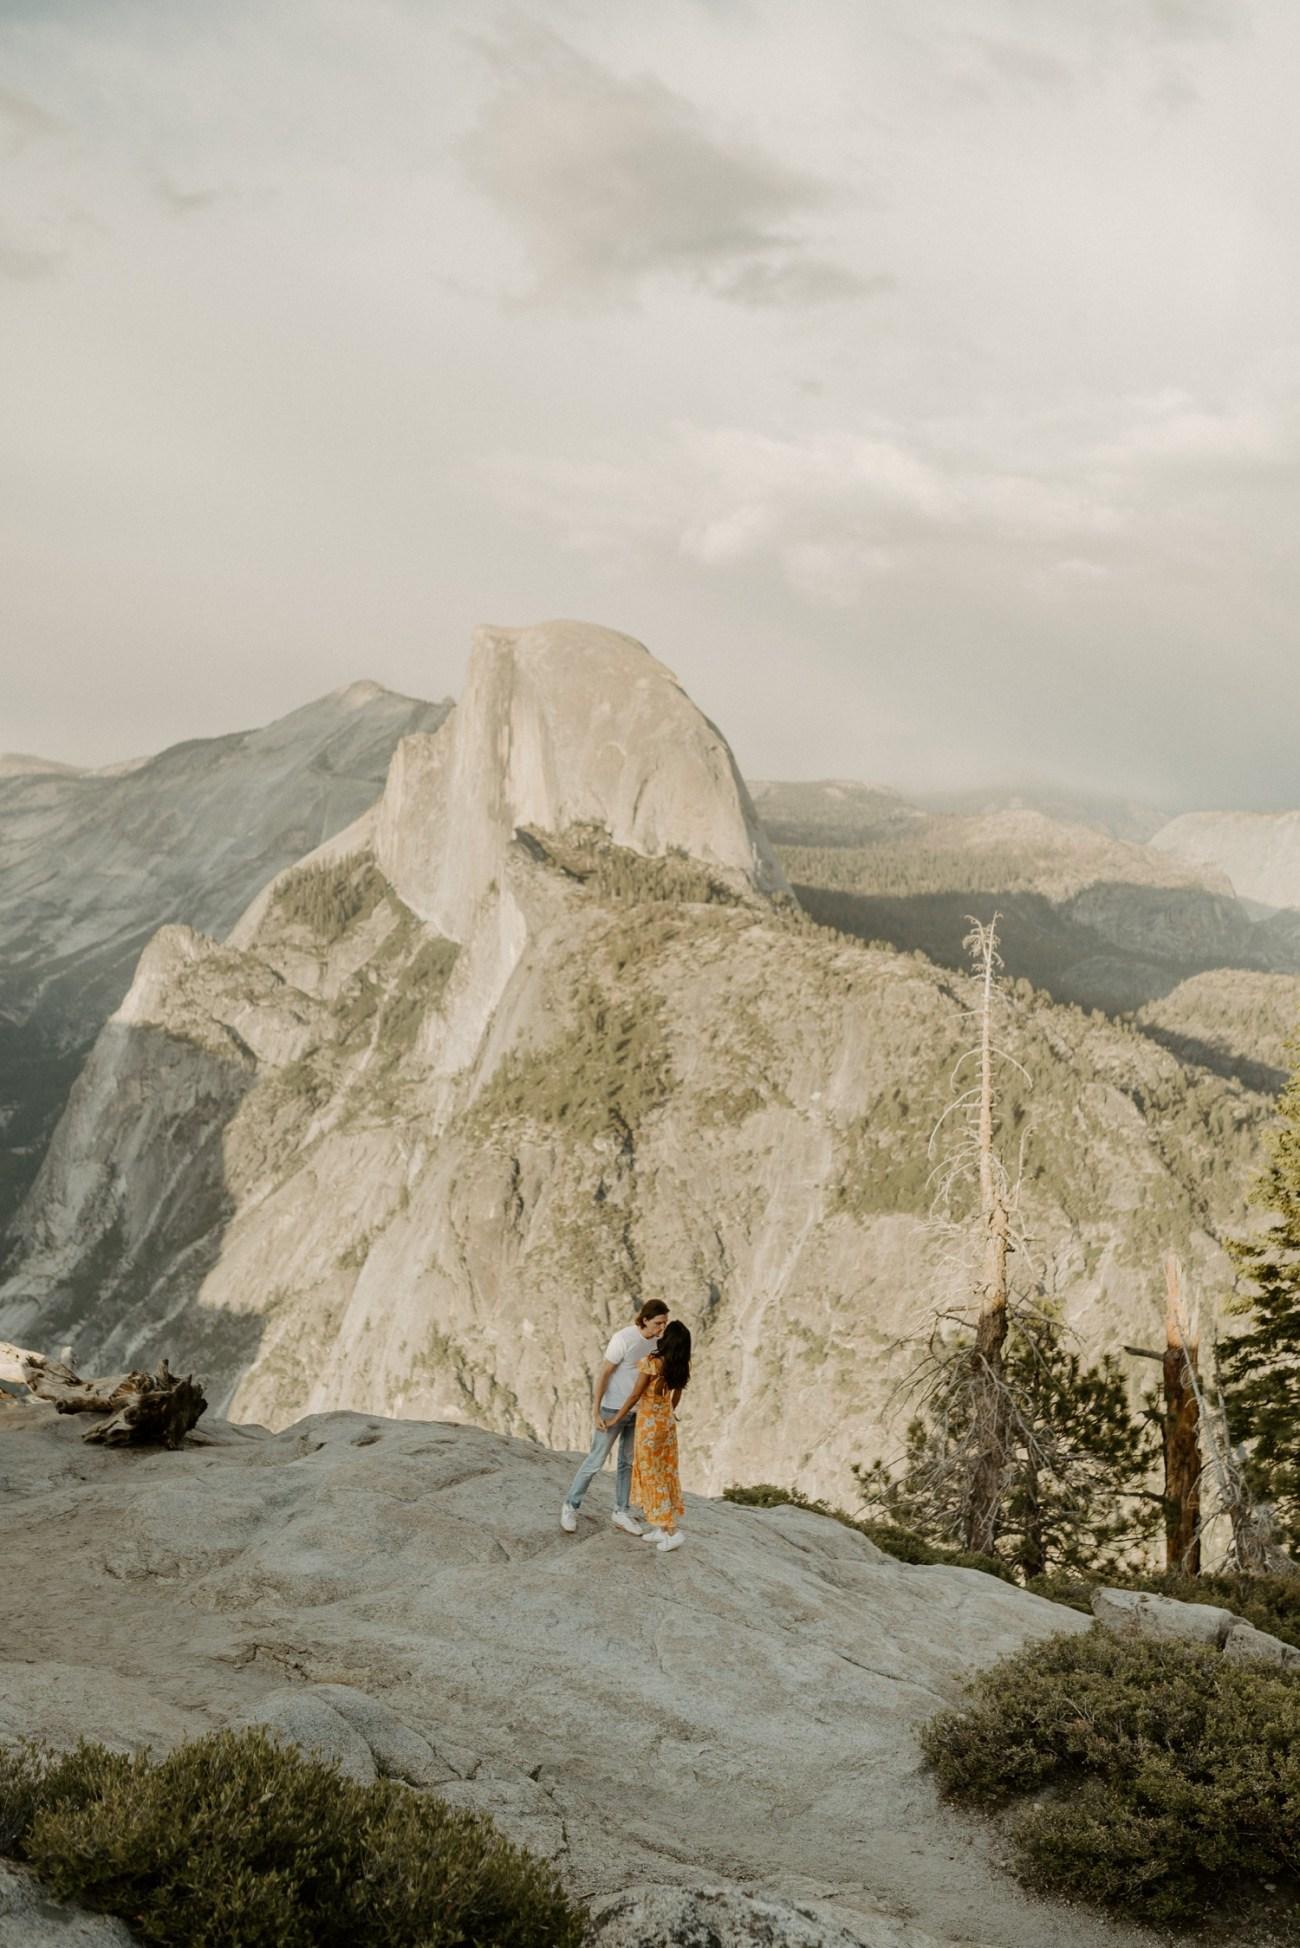 Sunset Yosemite Glacier Point Engagement Session Anais Possamai Photography 05